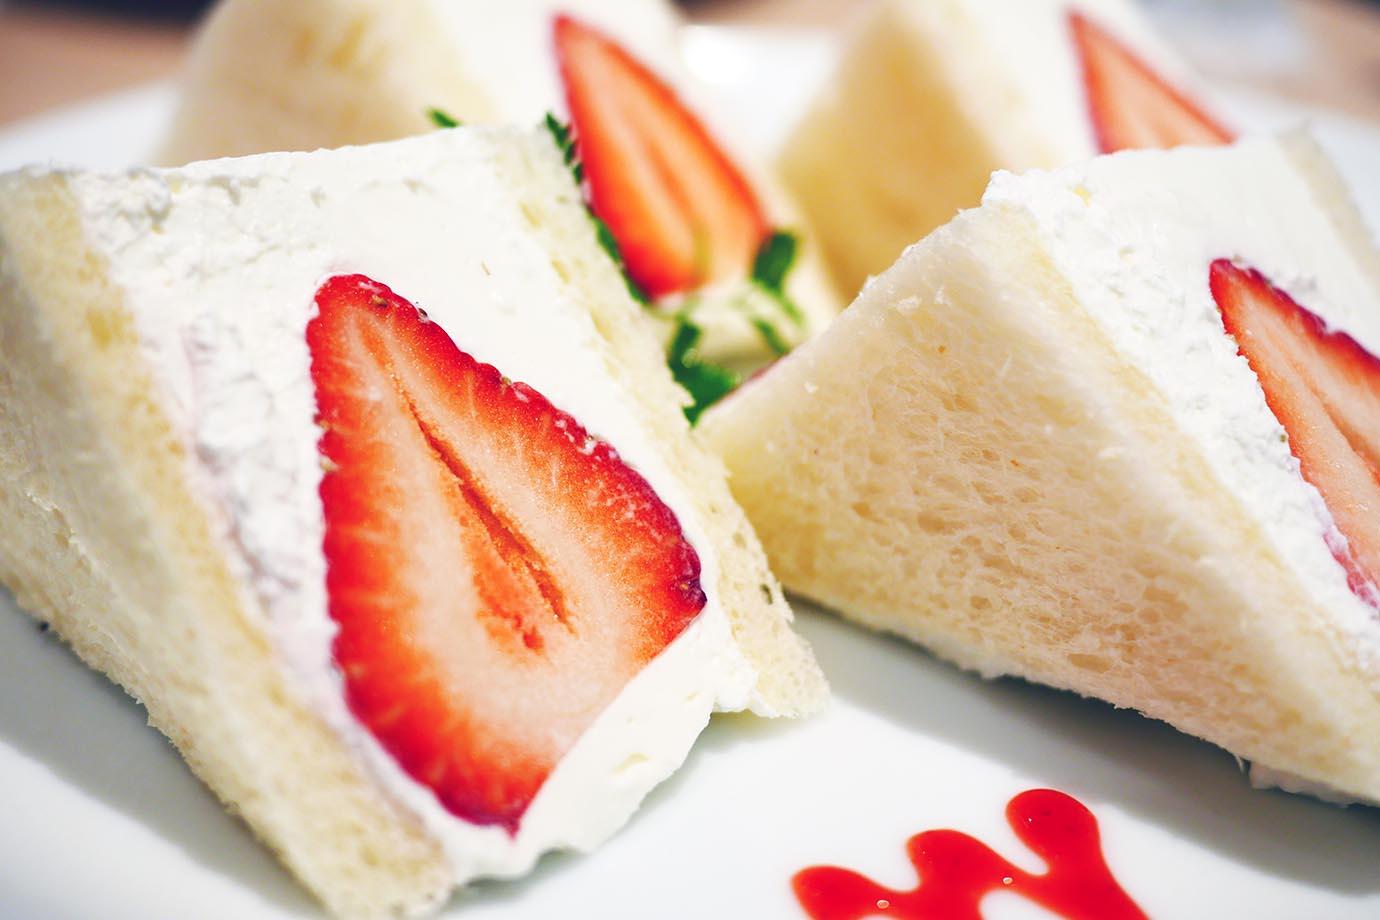 strawberry-sandwich1